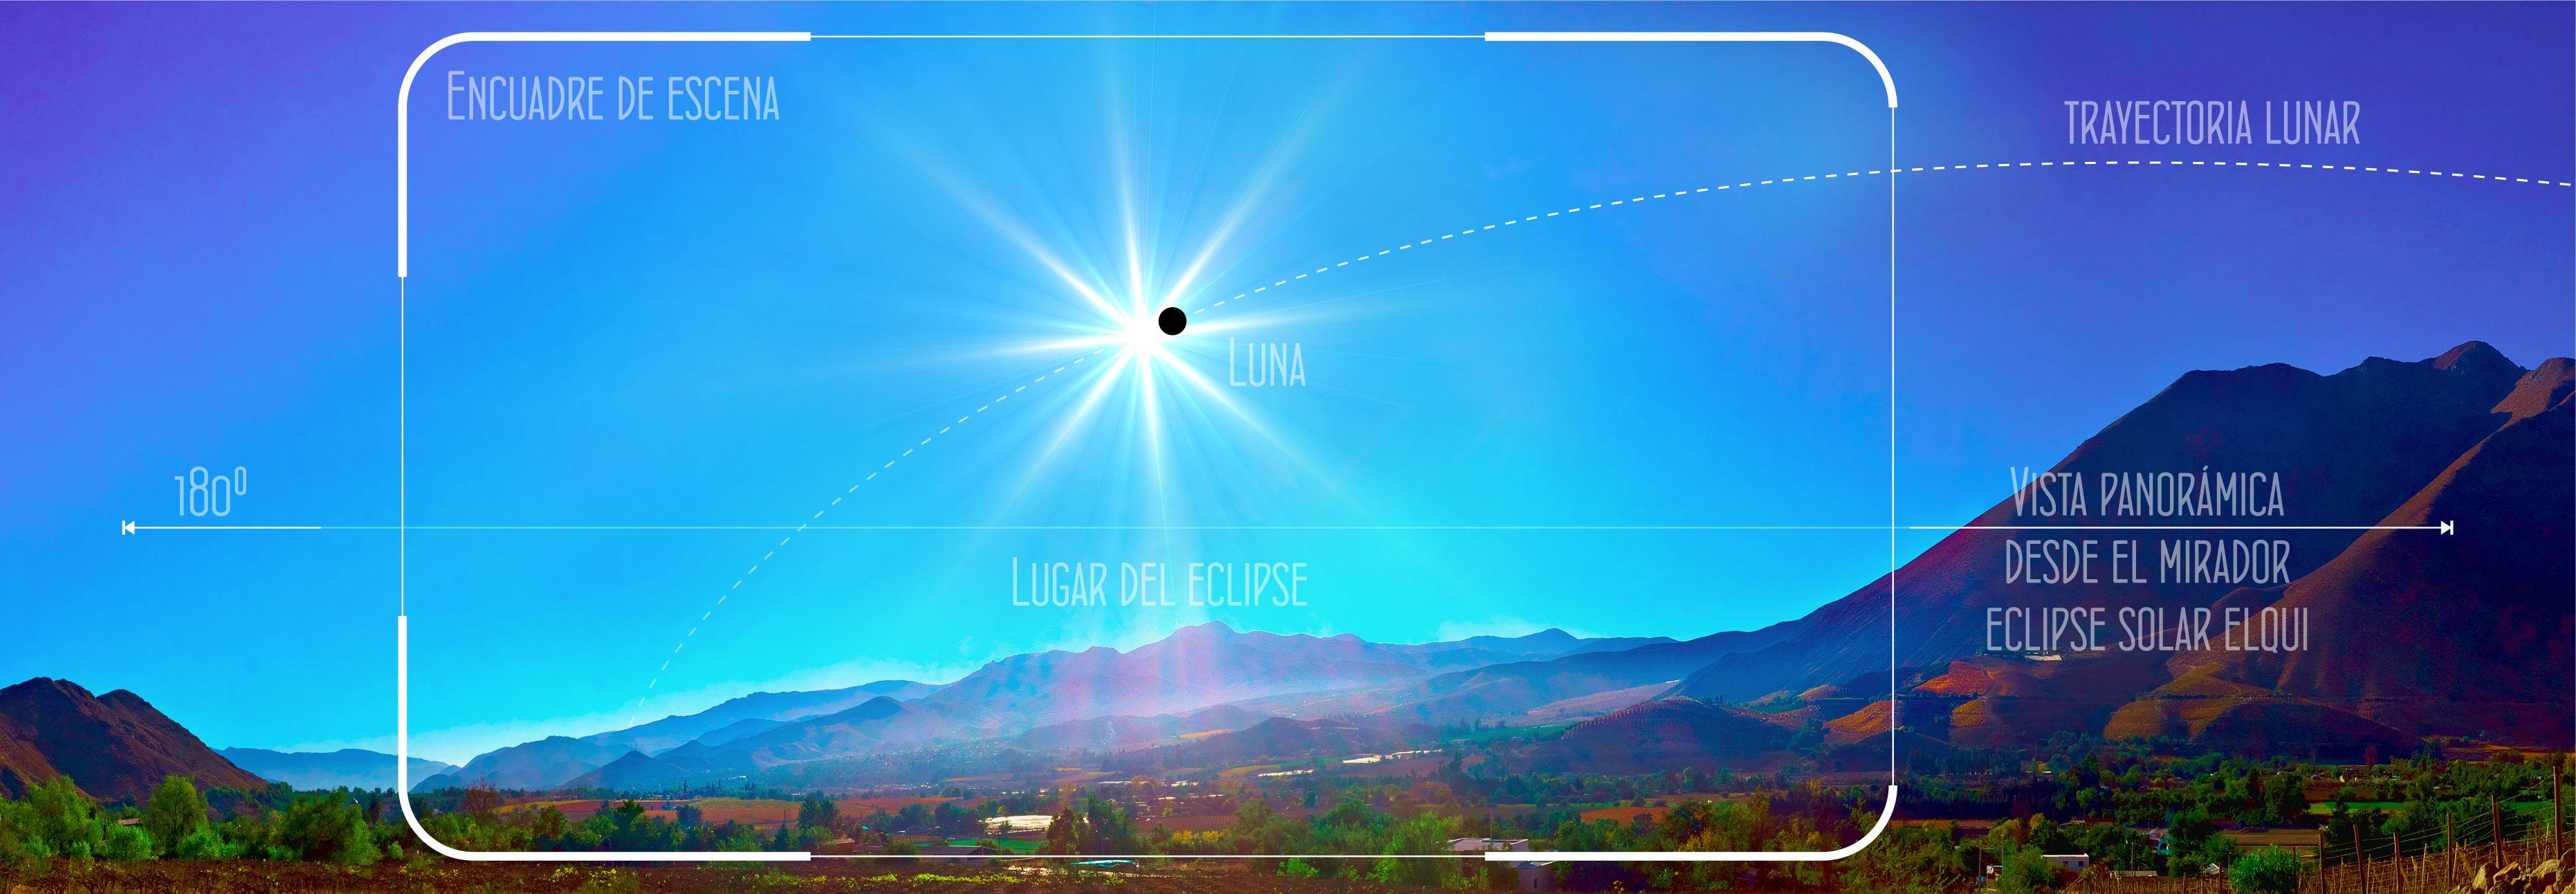 Infografia eclipse